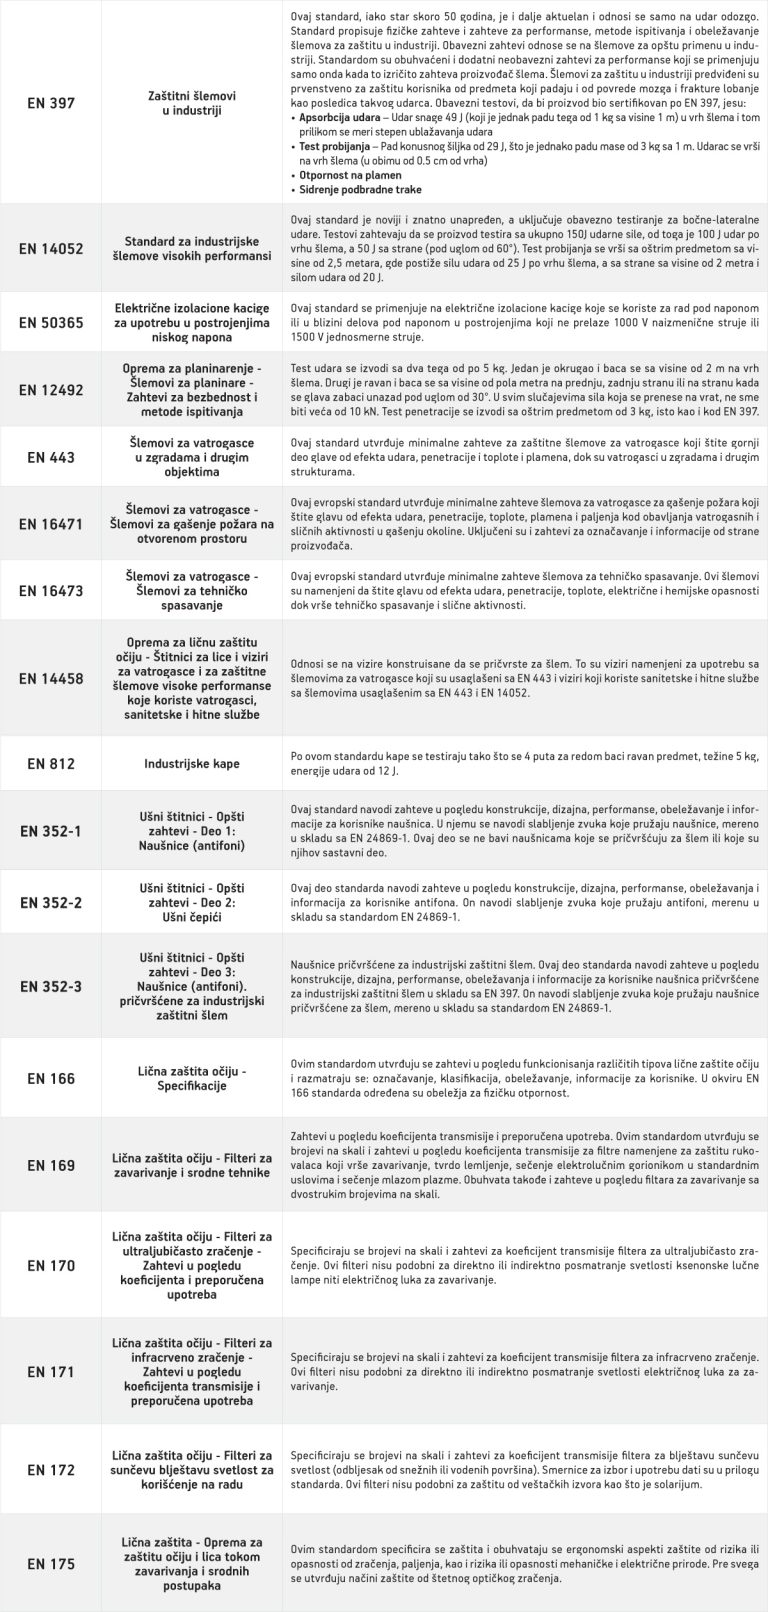 6EN-standardi-zastita-glave-lica-i-sluha